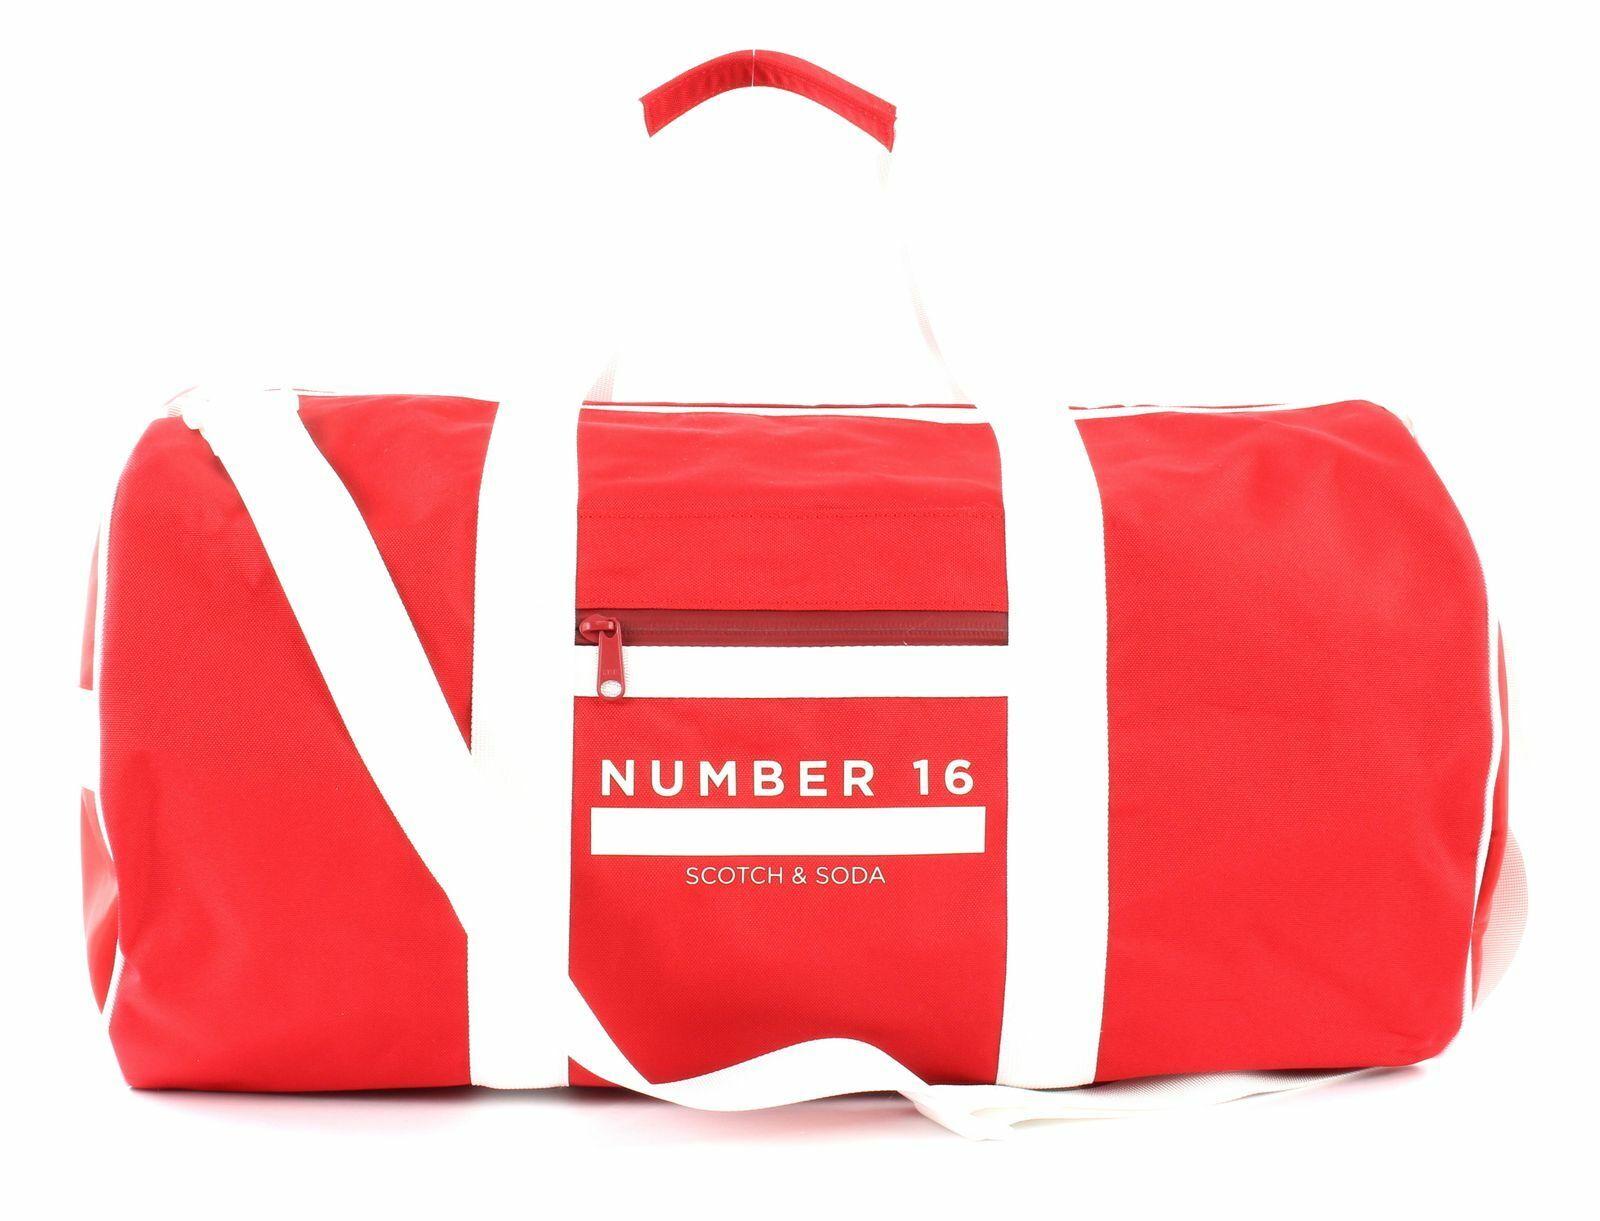 SCOTCH & SODA Ams Azulw Off Duty Bag Combo B